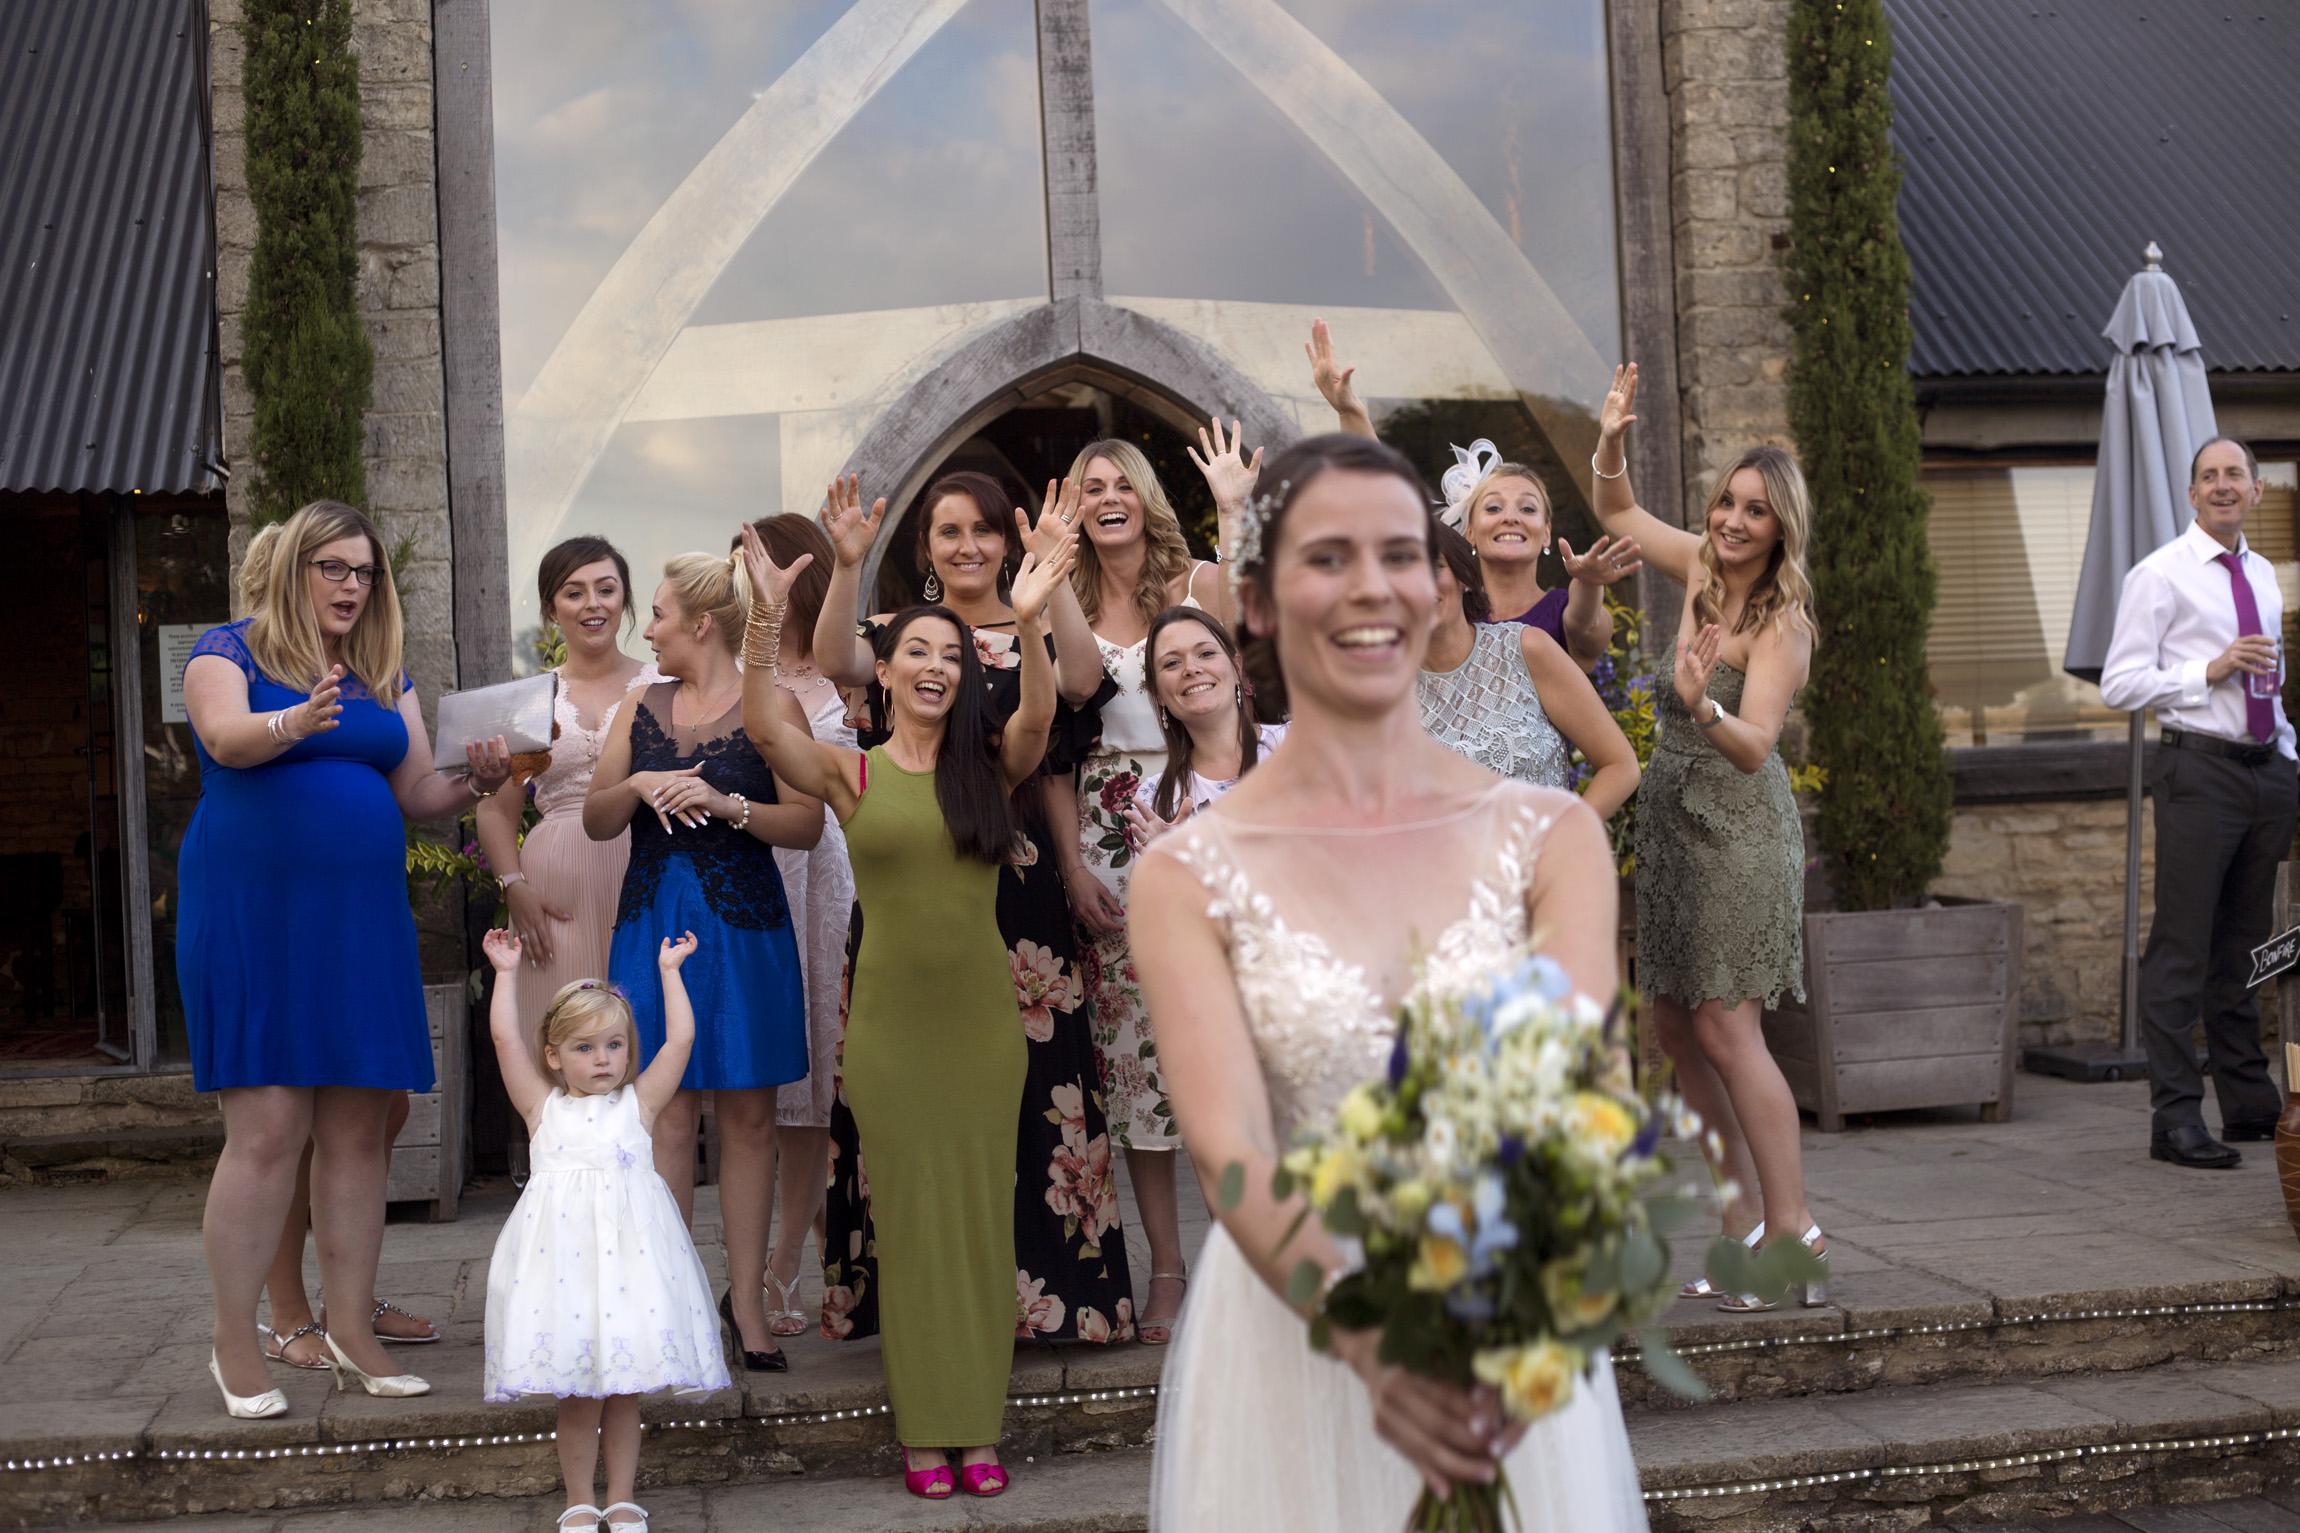 Bride throwing the bouquet Cripps barn outdoor wedding photographer